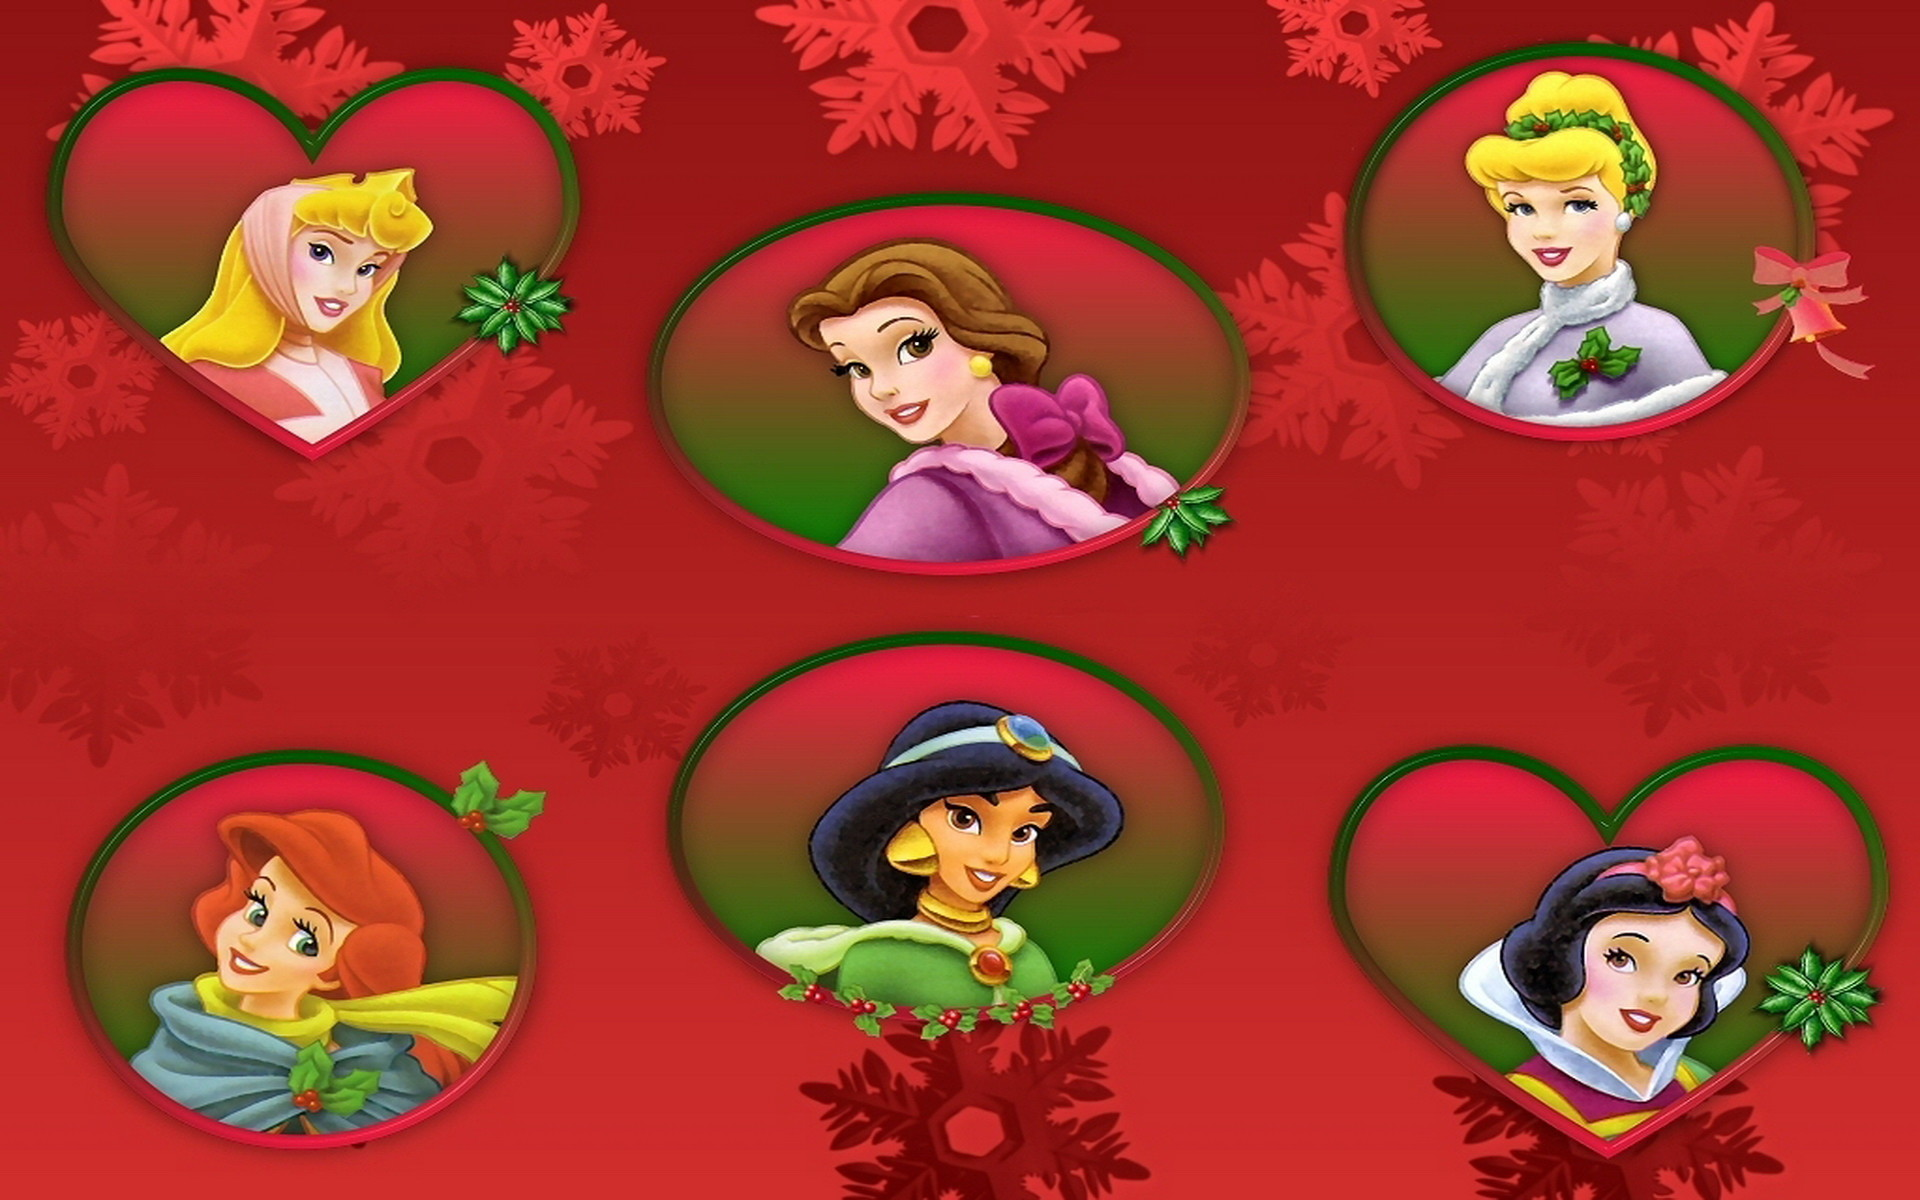 1920x1200 Disney Princess Wallpaper